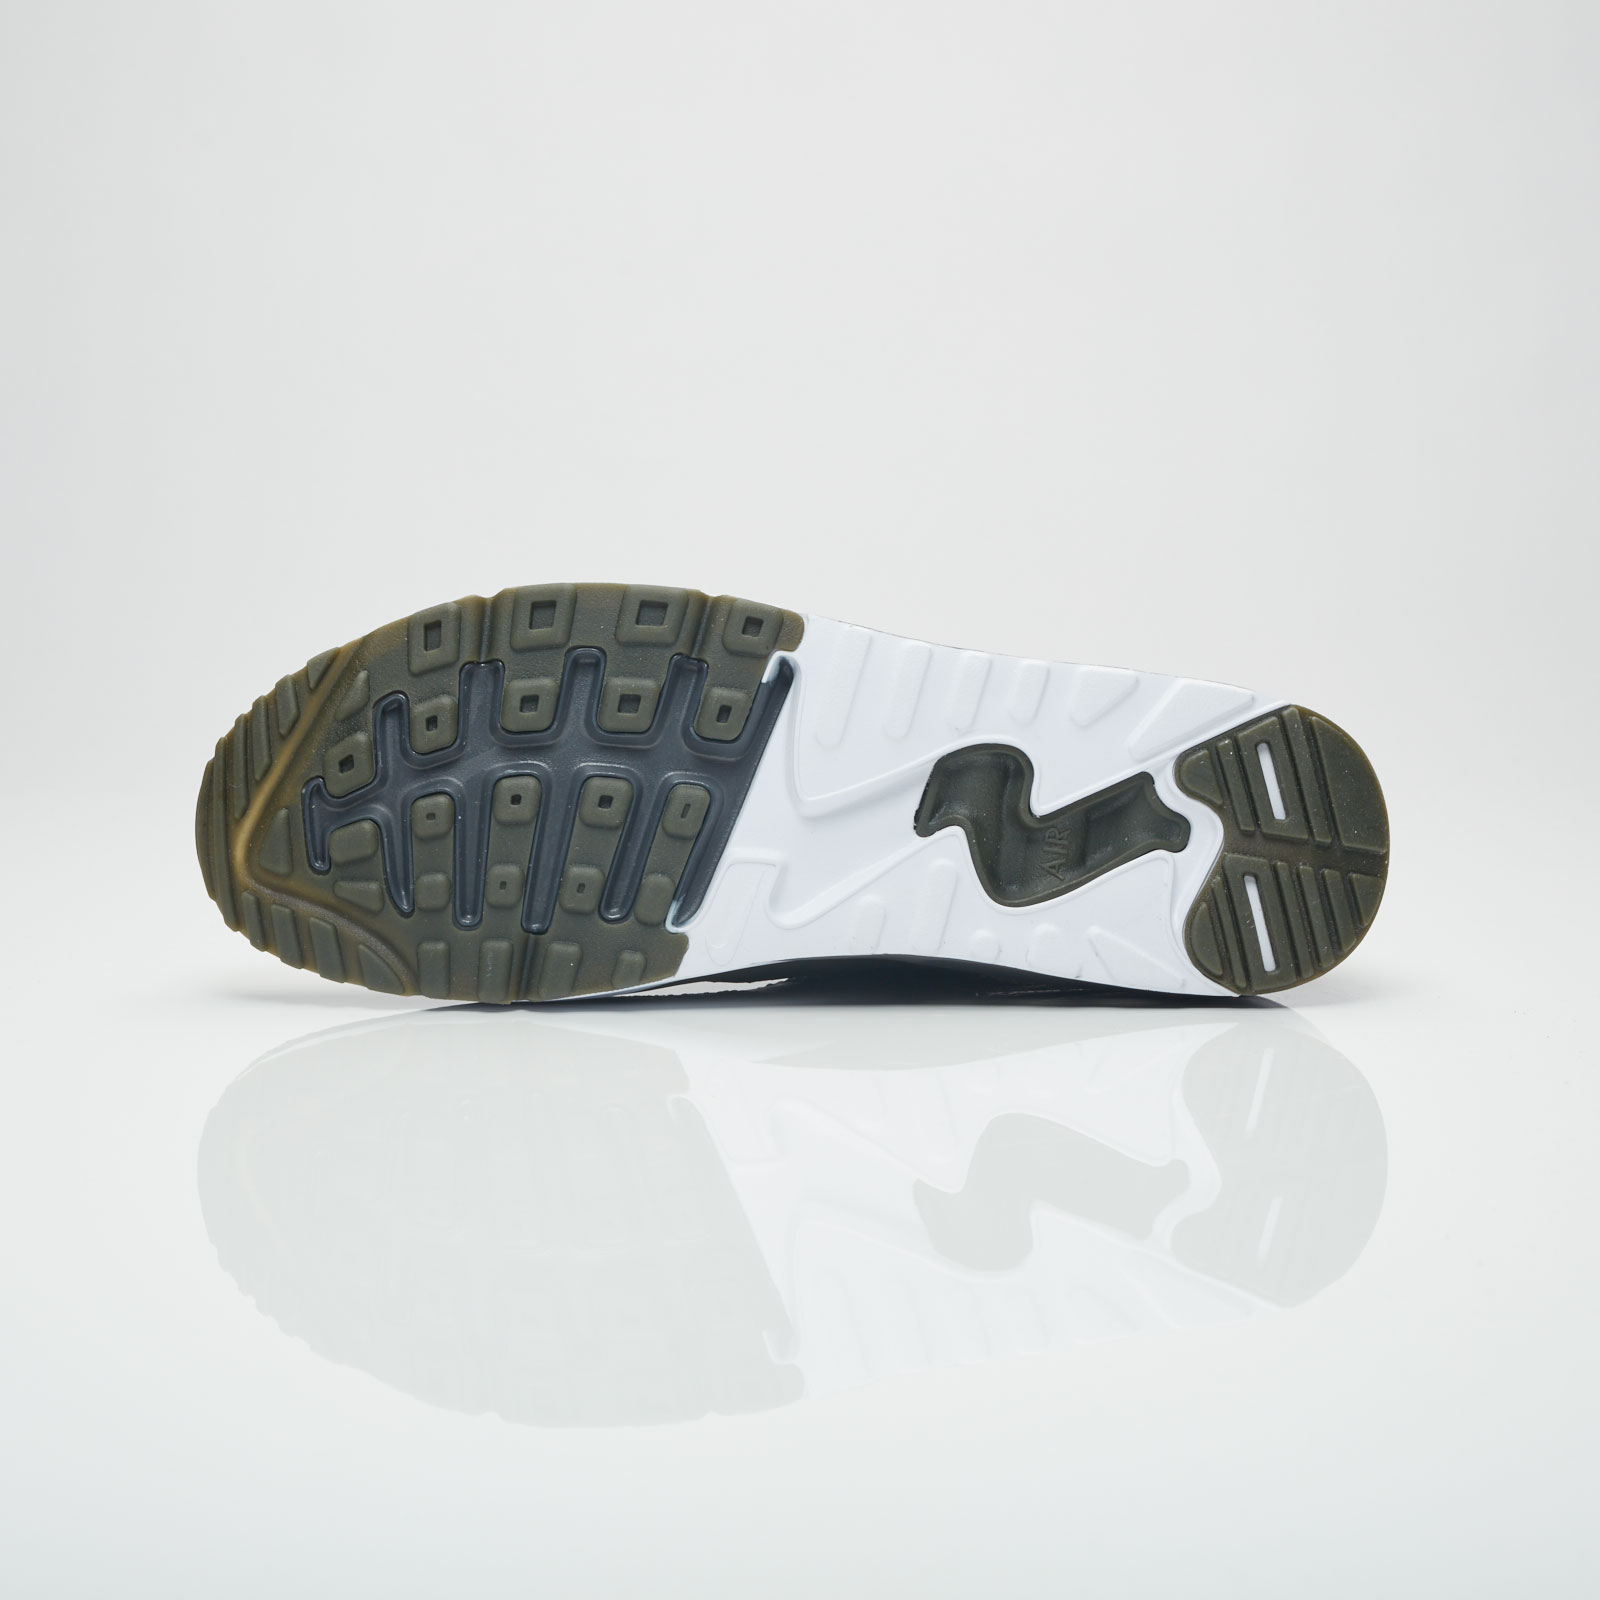 3f51dcafc45d Nike Air Max 90 Ultra 2.0 Flyknit - 875943-300 - Sneakersnstuff ...